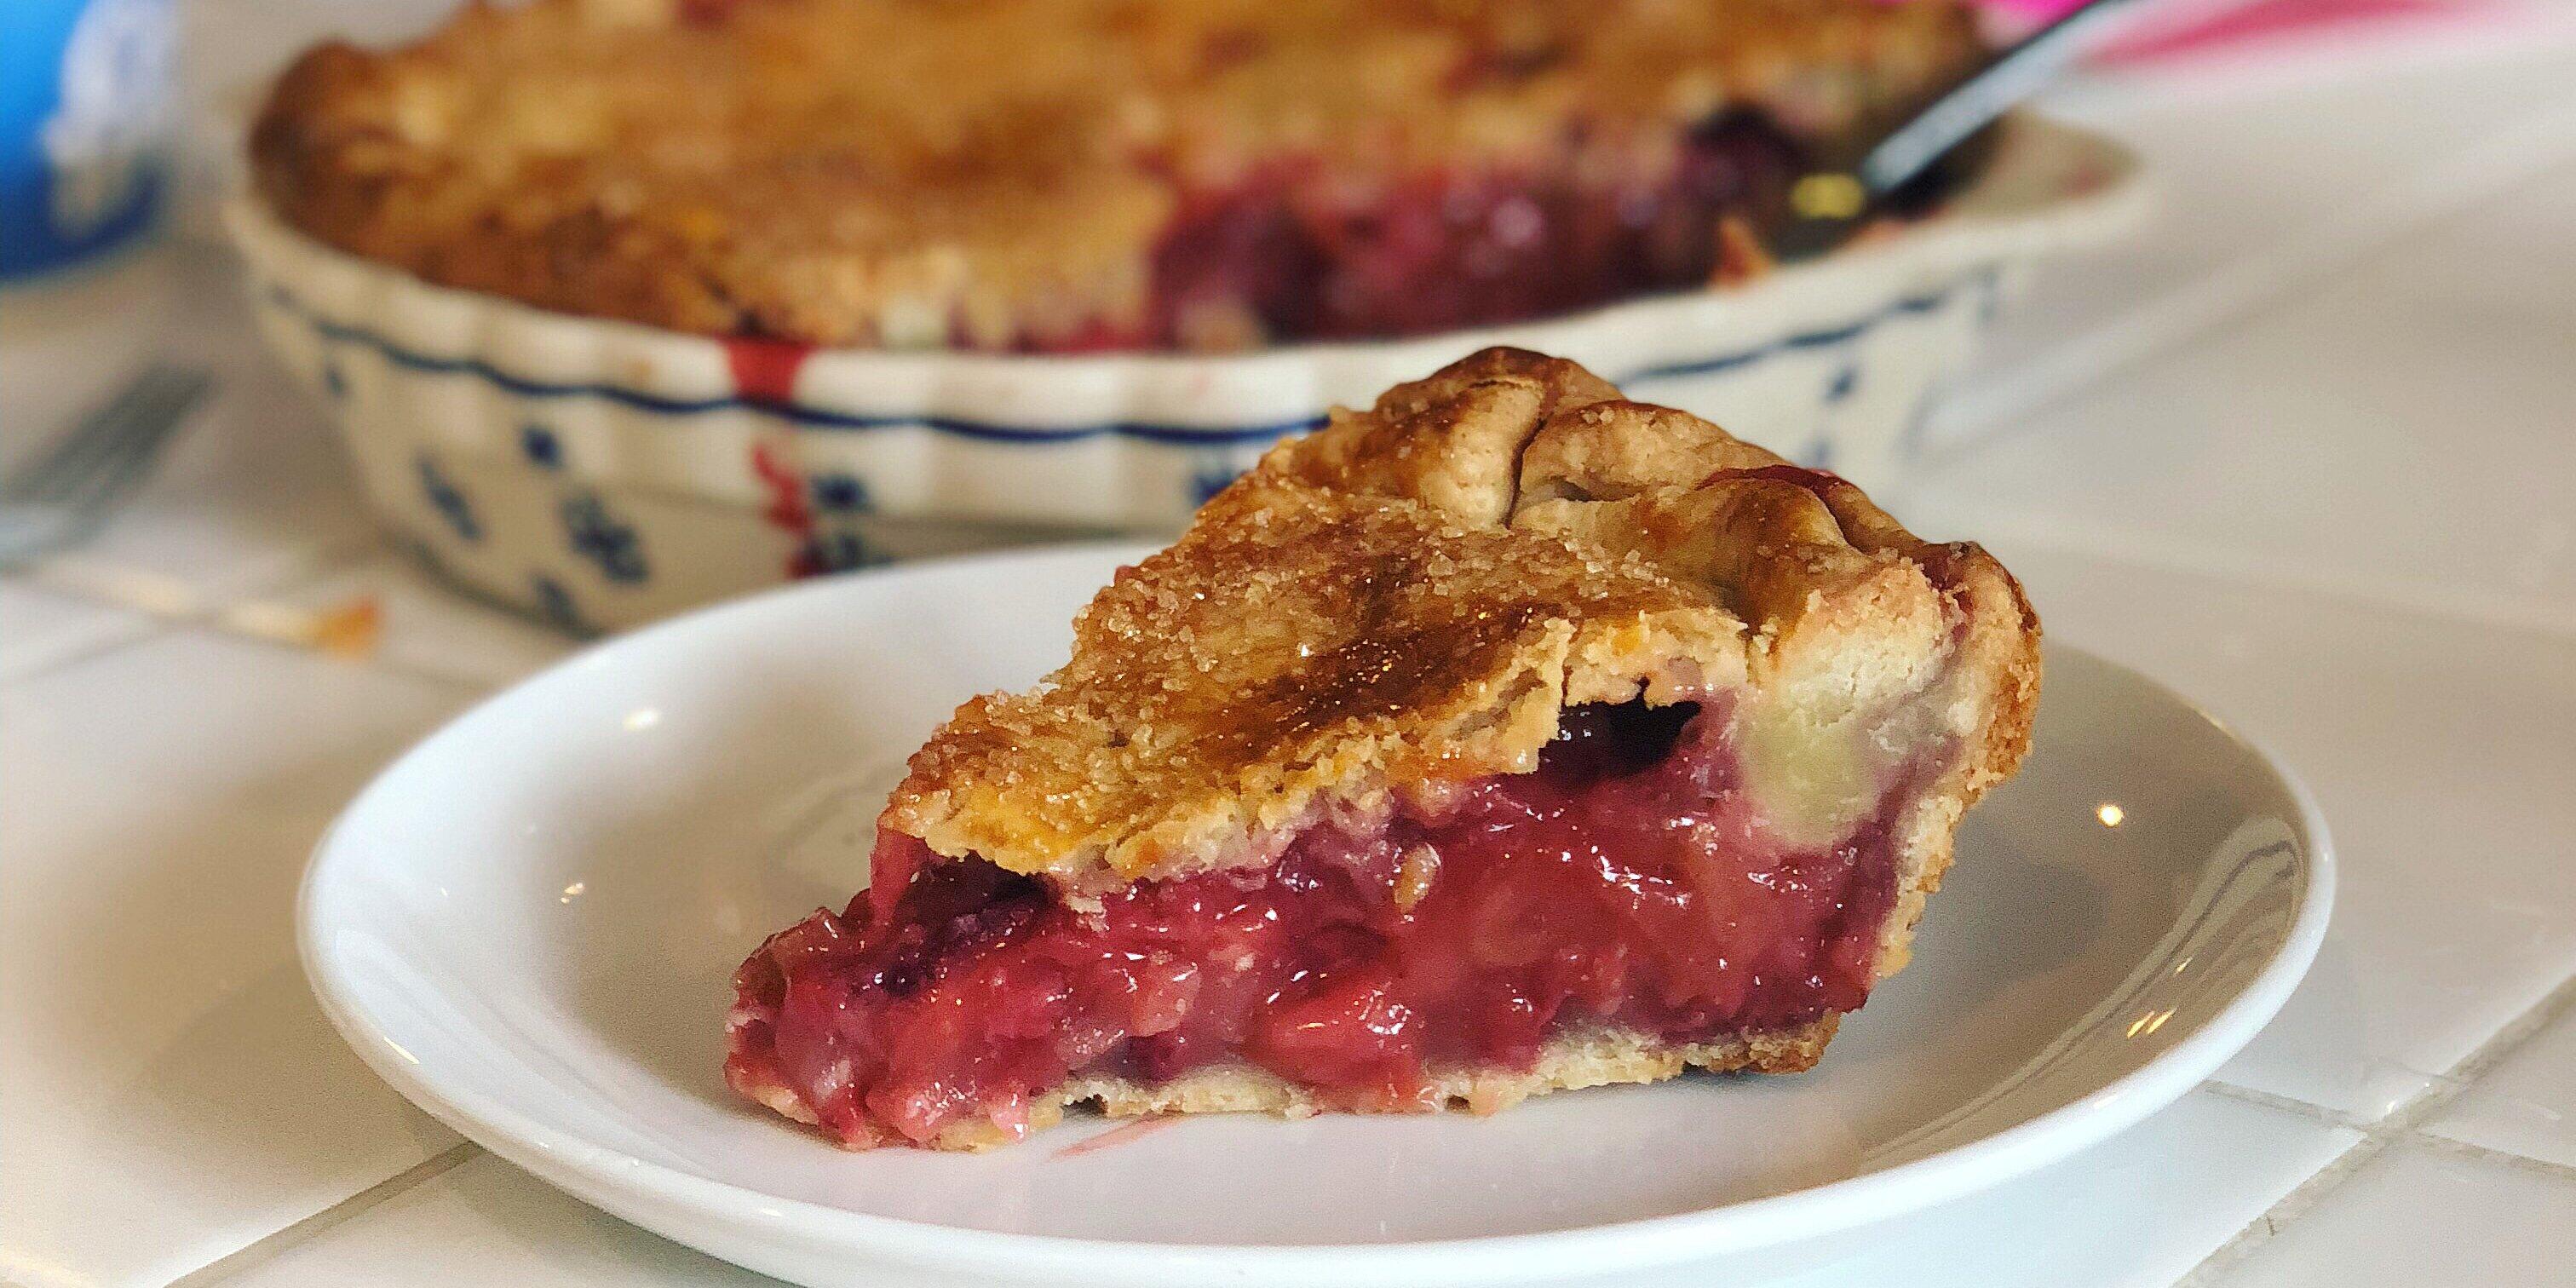 rhubarb and strawberry pie recipe